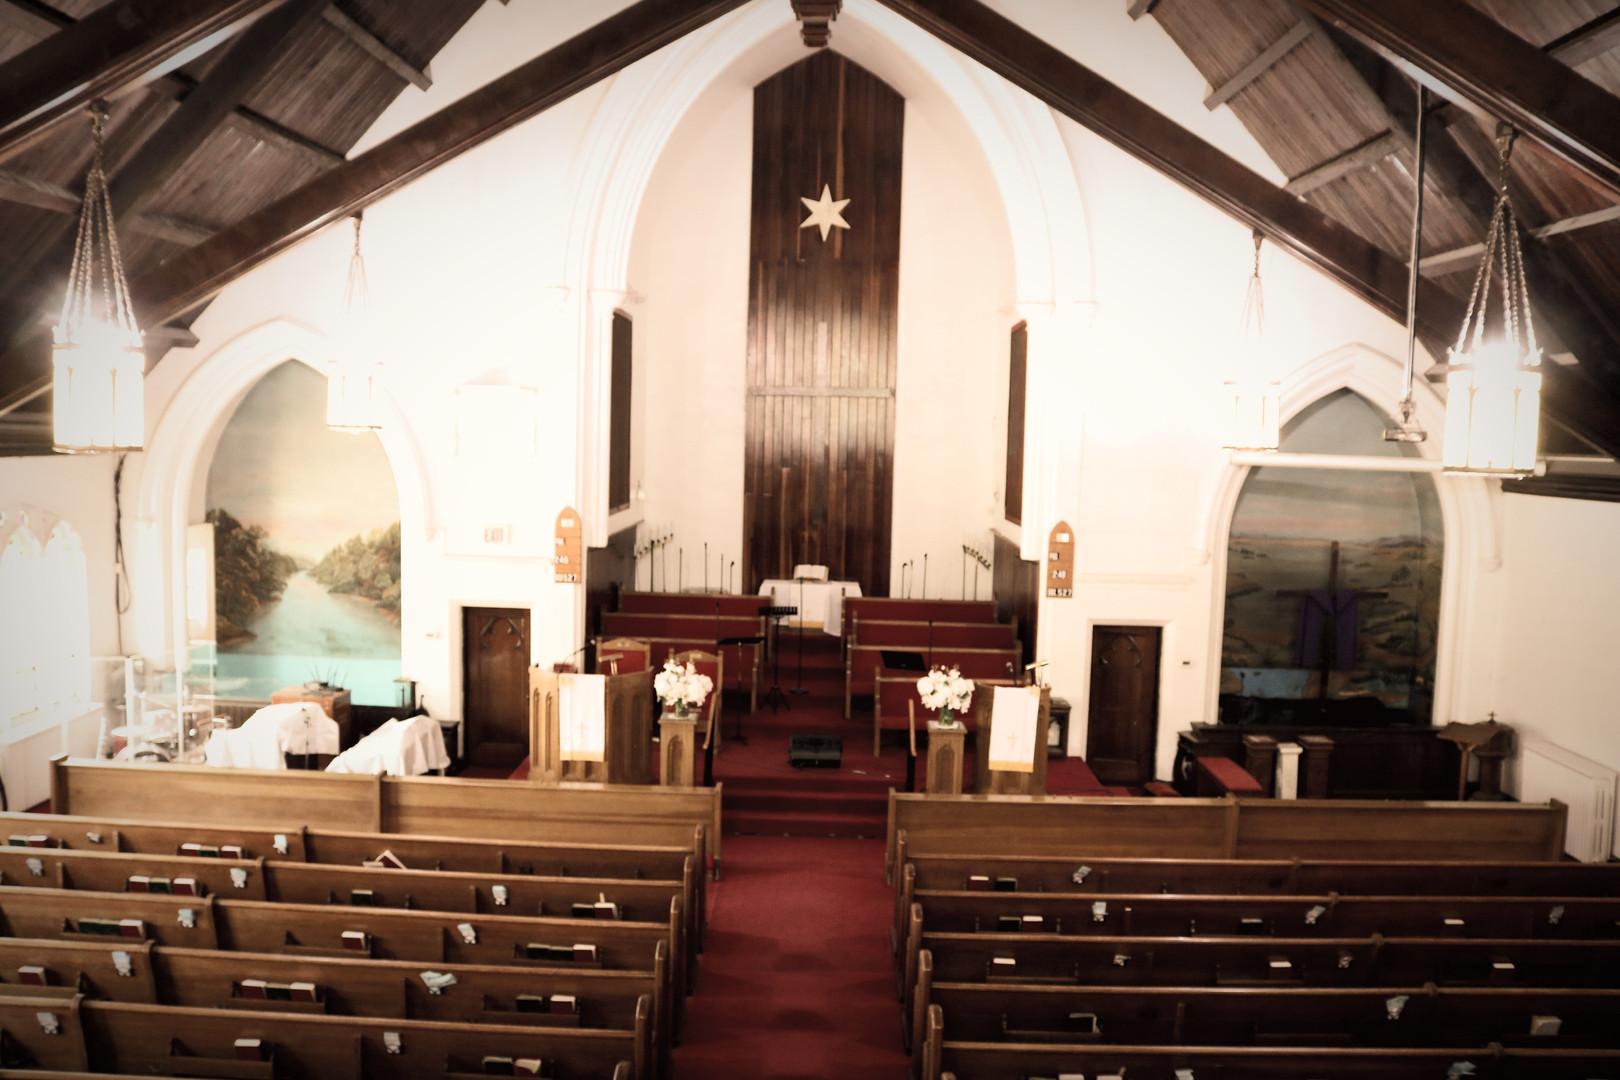 Inside church sanctuary from balcony